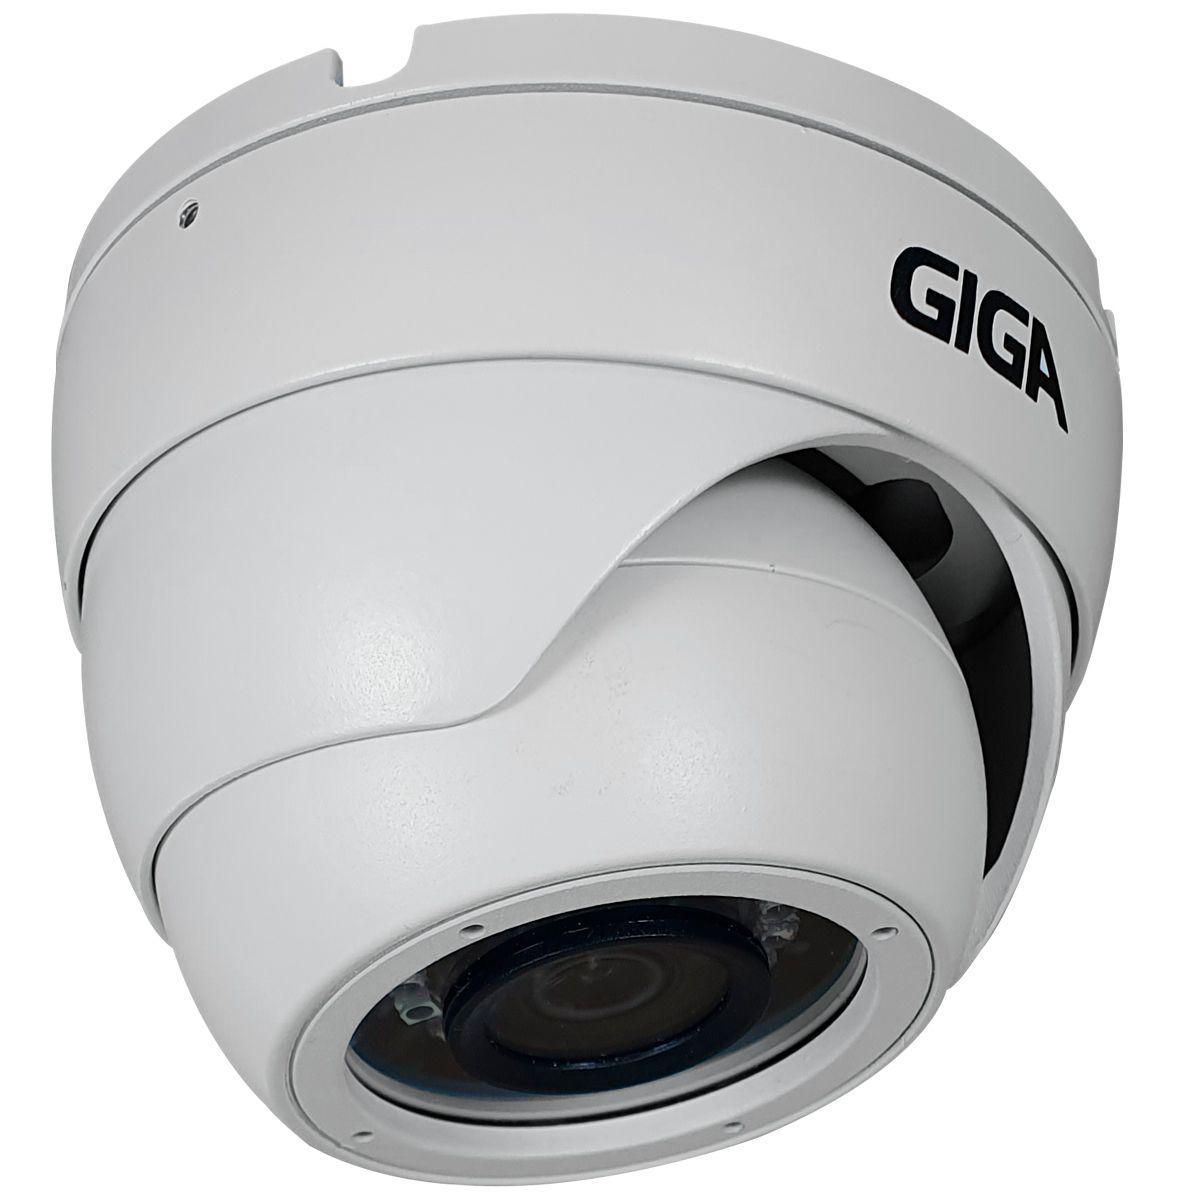 Kit Orion HD 720p 16 Câmeras GS0021 + DVR Giga Security + HD 1TB Skygawk + Acessórios  - Tudo Forte